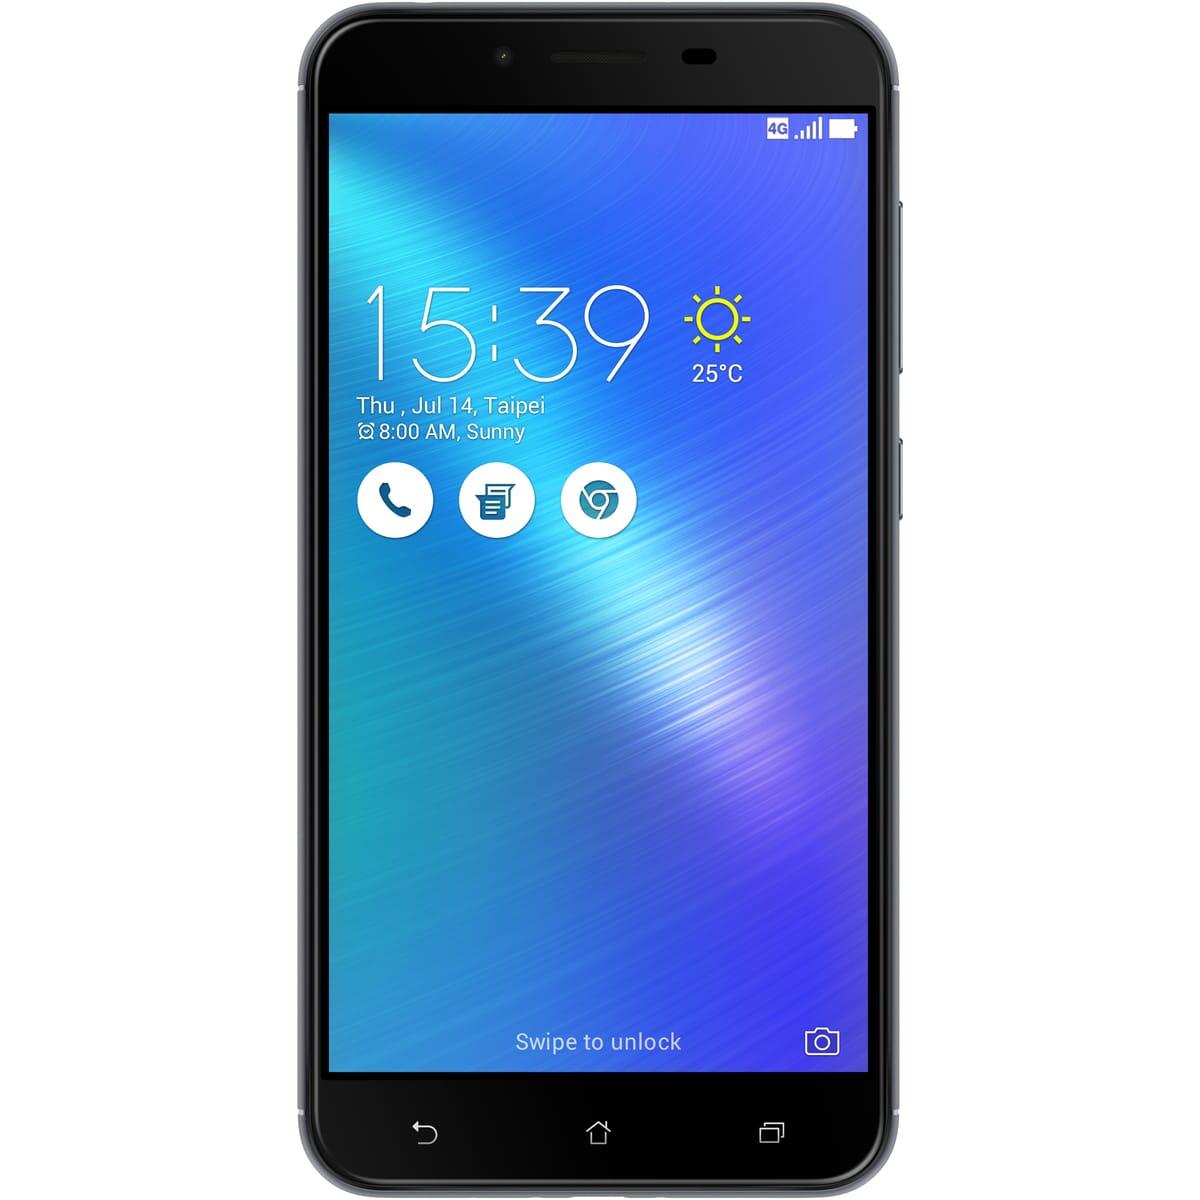 "Smartphone 5.5"" Asus Zenfone 3 Max Plus - RAM 3 Go, ROM 32 Go, Double Micro-SIM (via 124.5€ sur la cagnotte)"